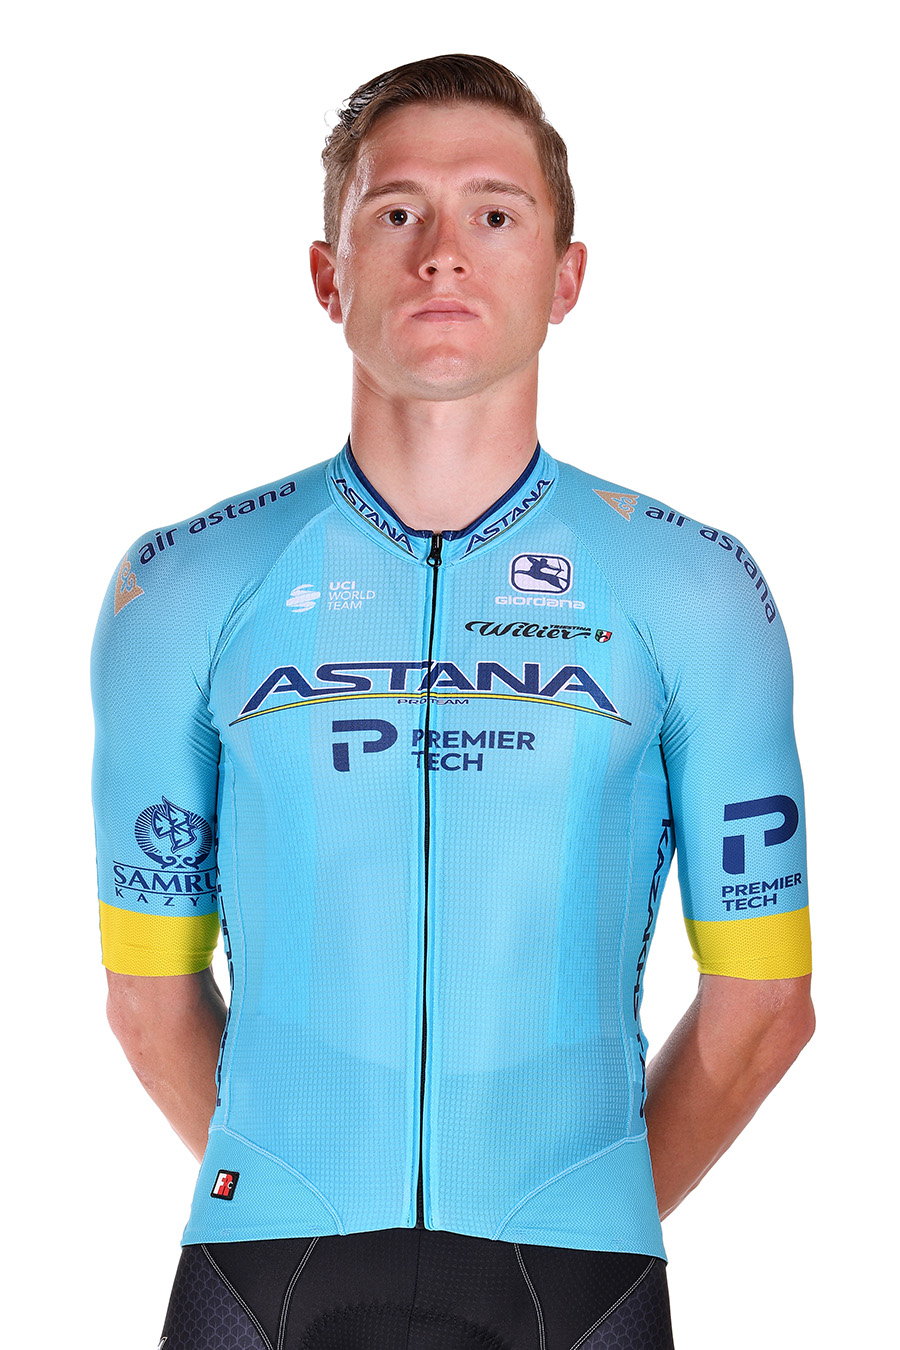 Yevgeniy Gidich Astana 2020